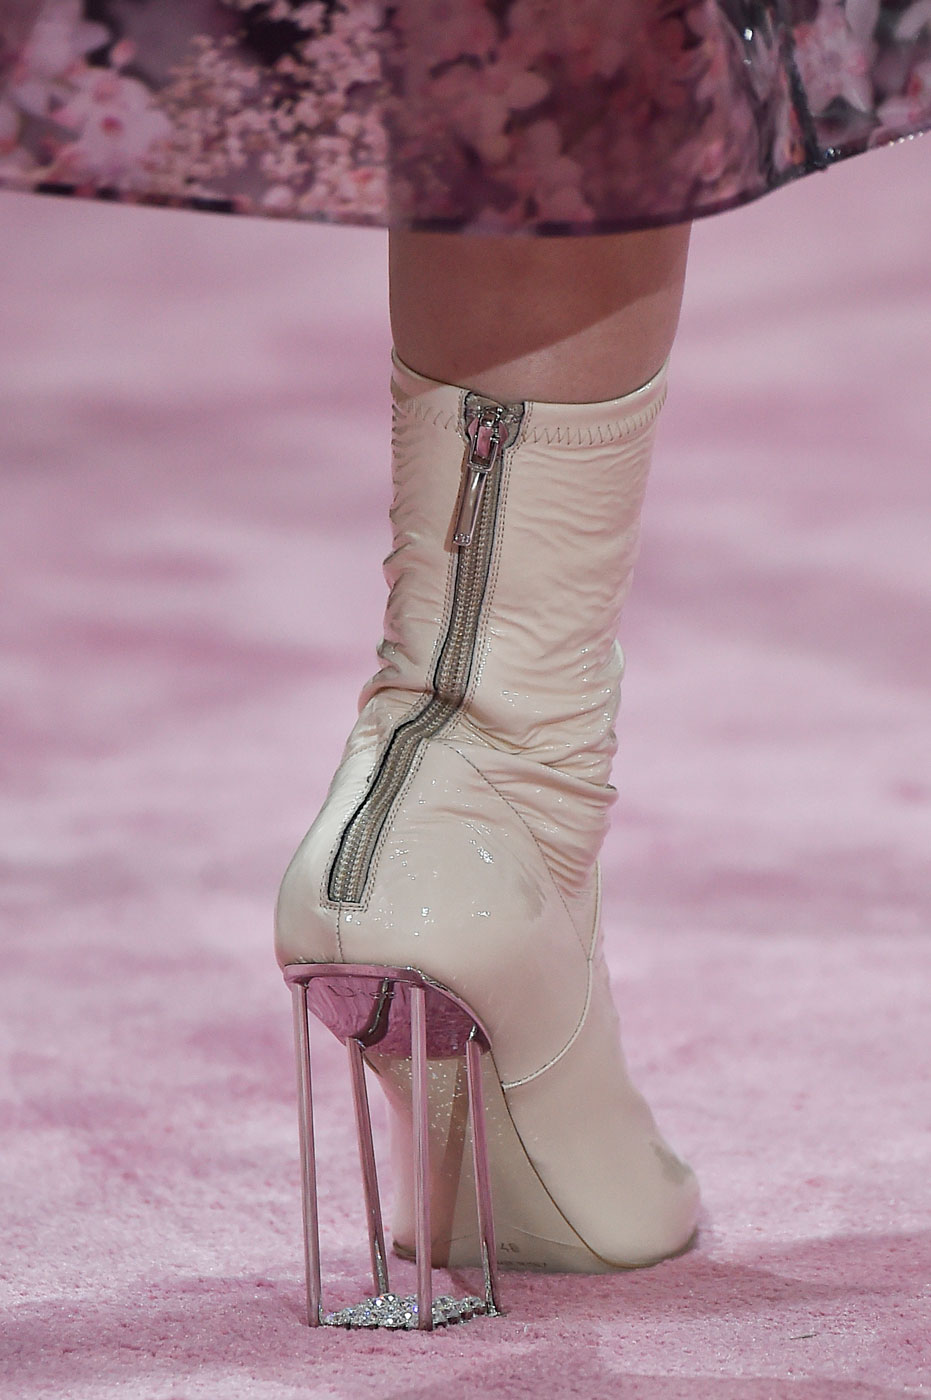 Christian-Dior-fashion-runway-show-close-ups-haute-couture-paris-spring-summer-2015-the-impression-076